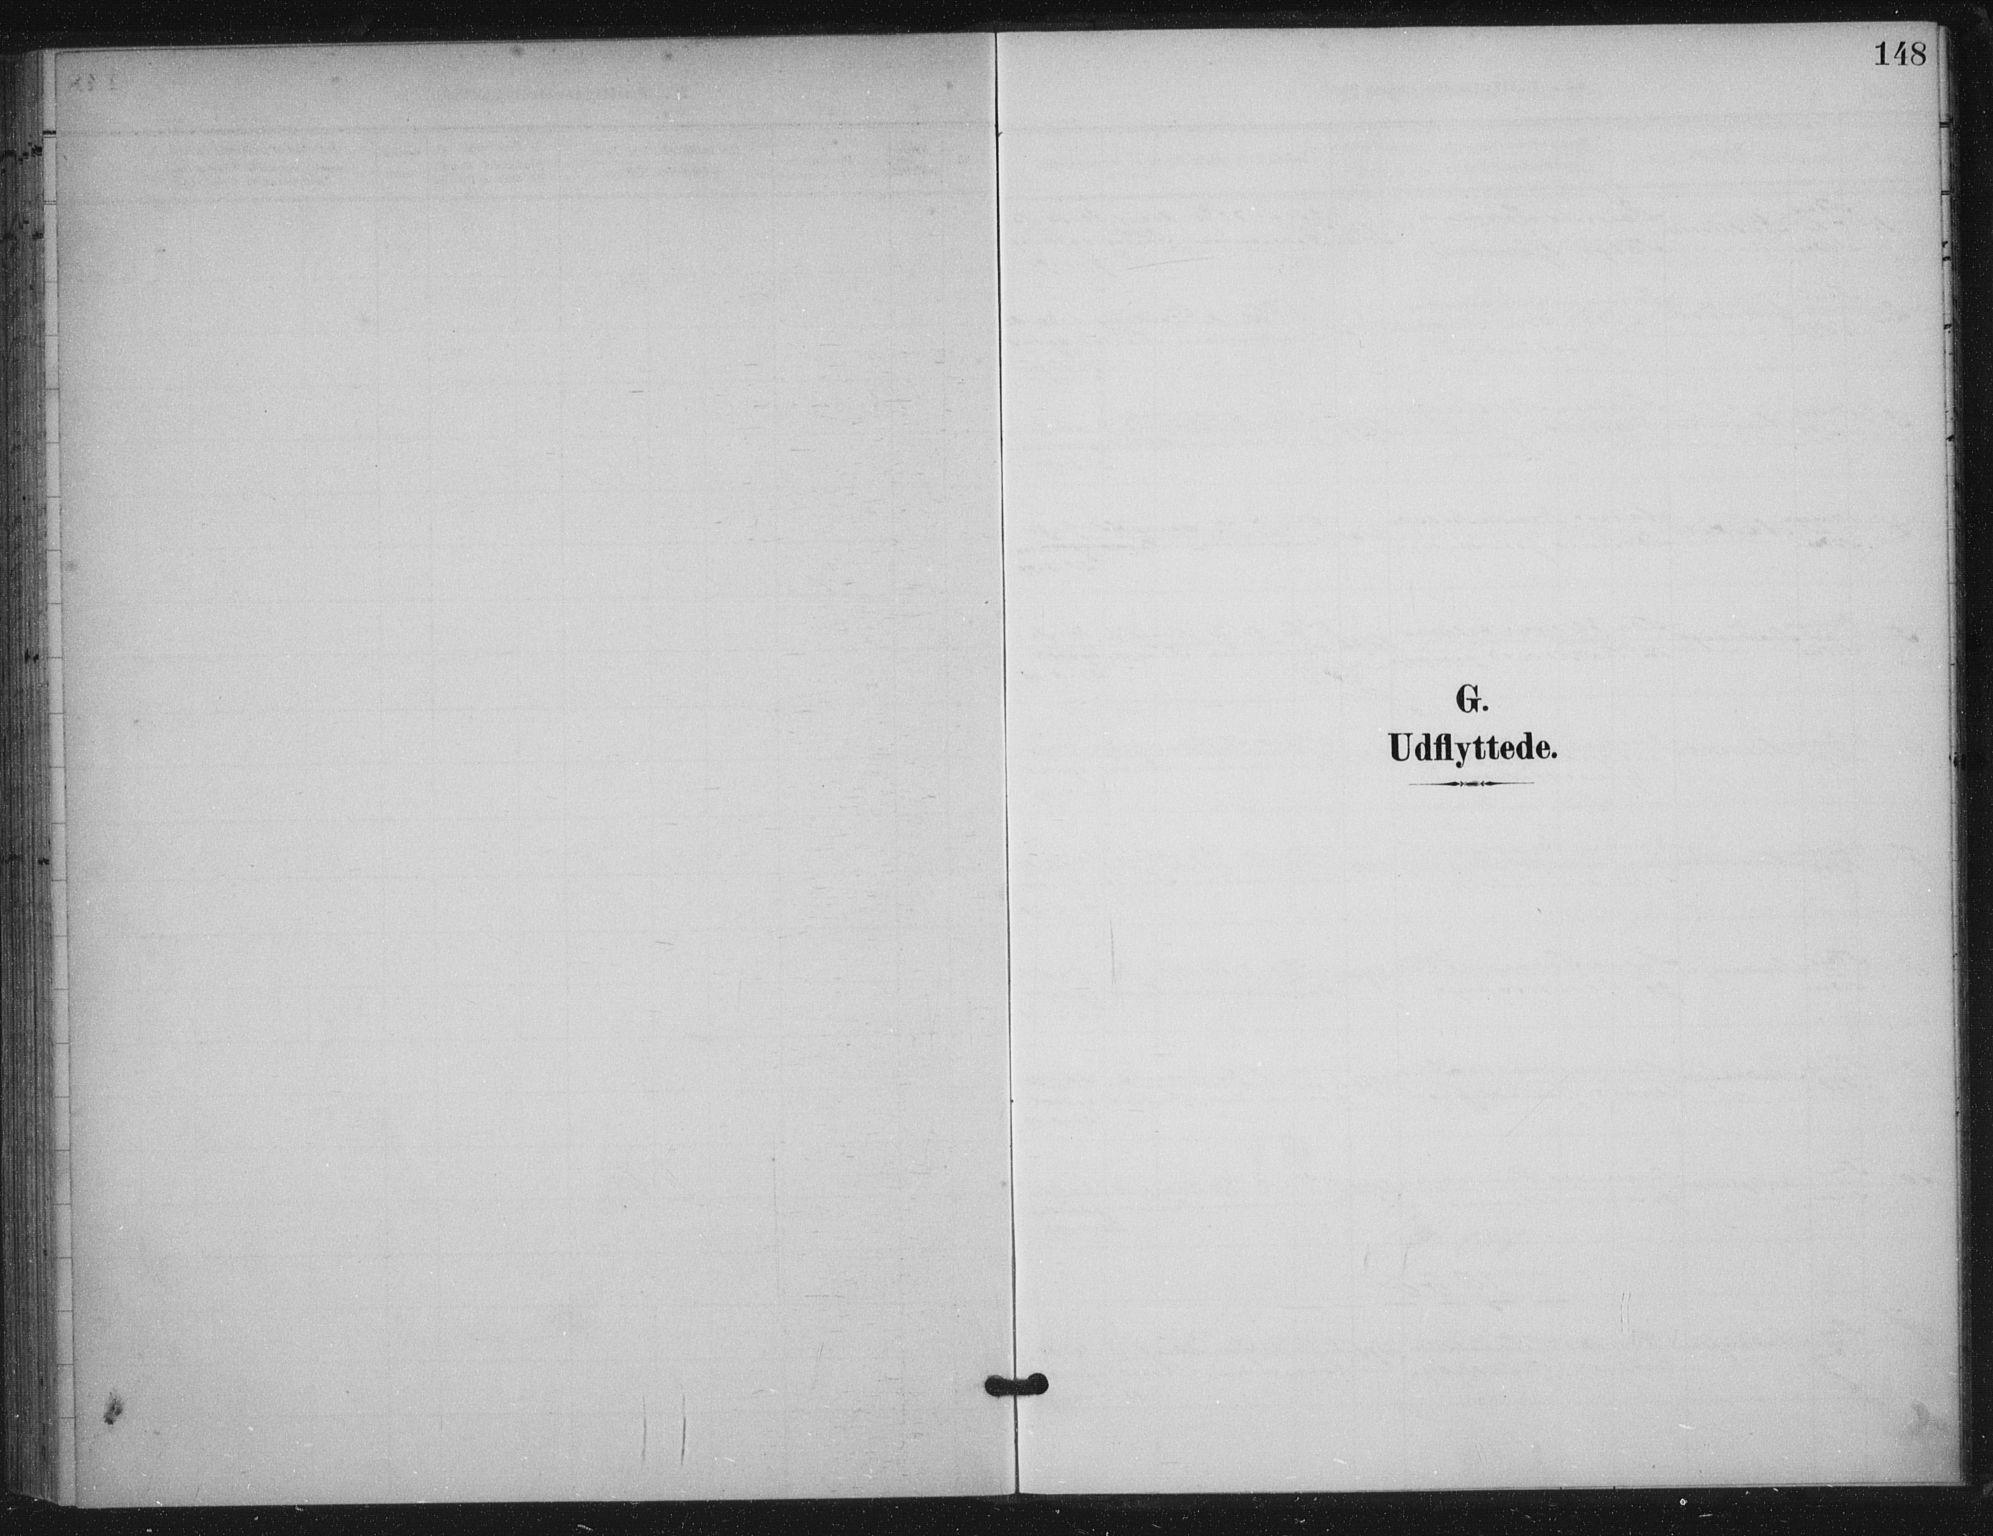 SAST, Skjold sokneprestkontor, H/Ha/Haa/L0012: Ministerialbok nr. A 12, 1899-1915, s. 148